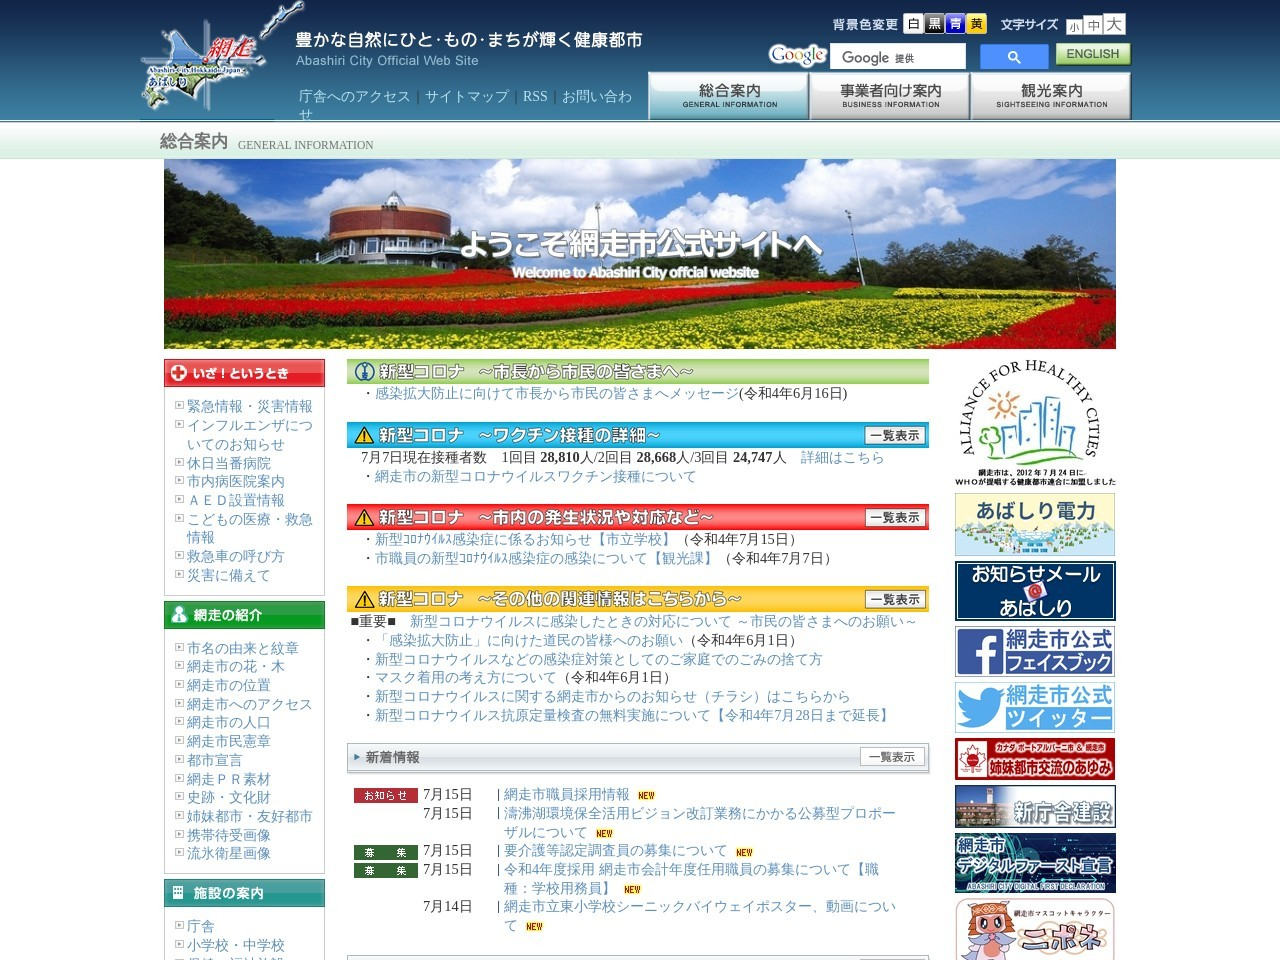 http://www.city.abashiri.hokkaido.jp/060soshiki/010kikakuchousei/index.html